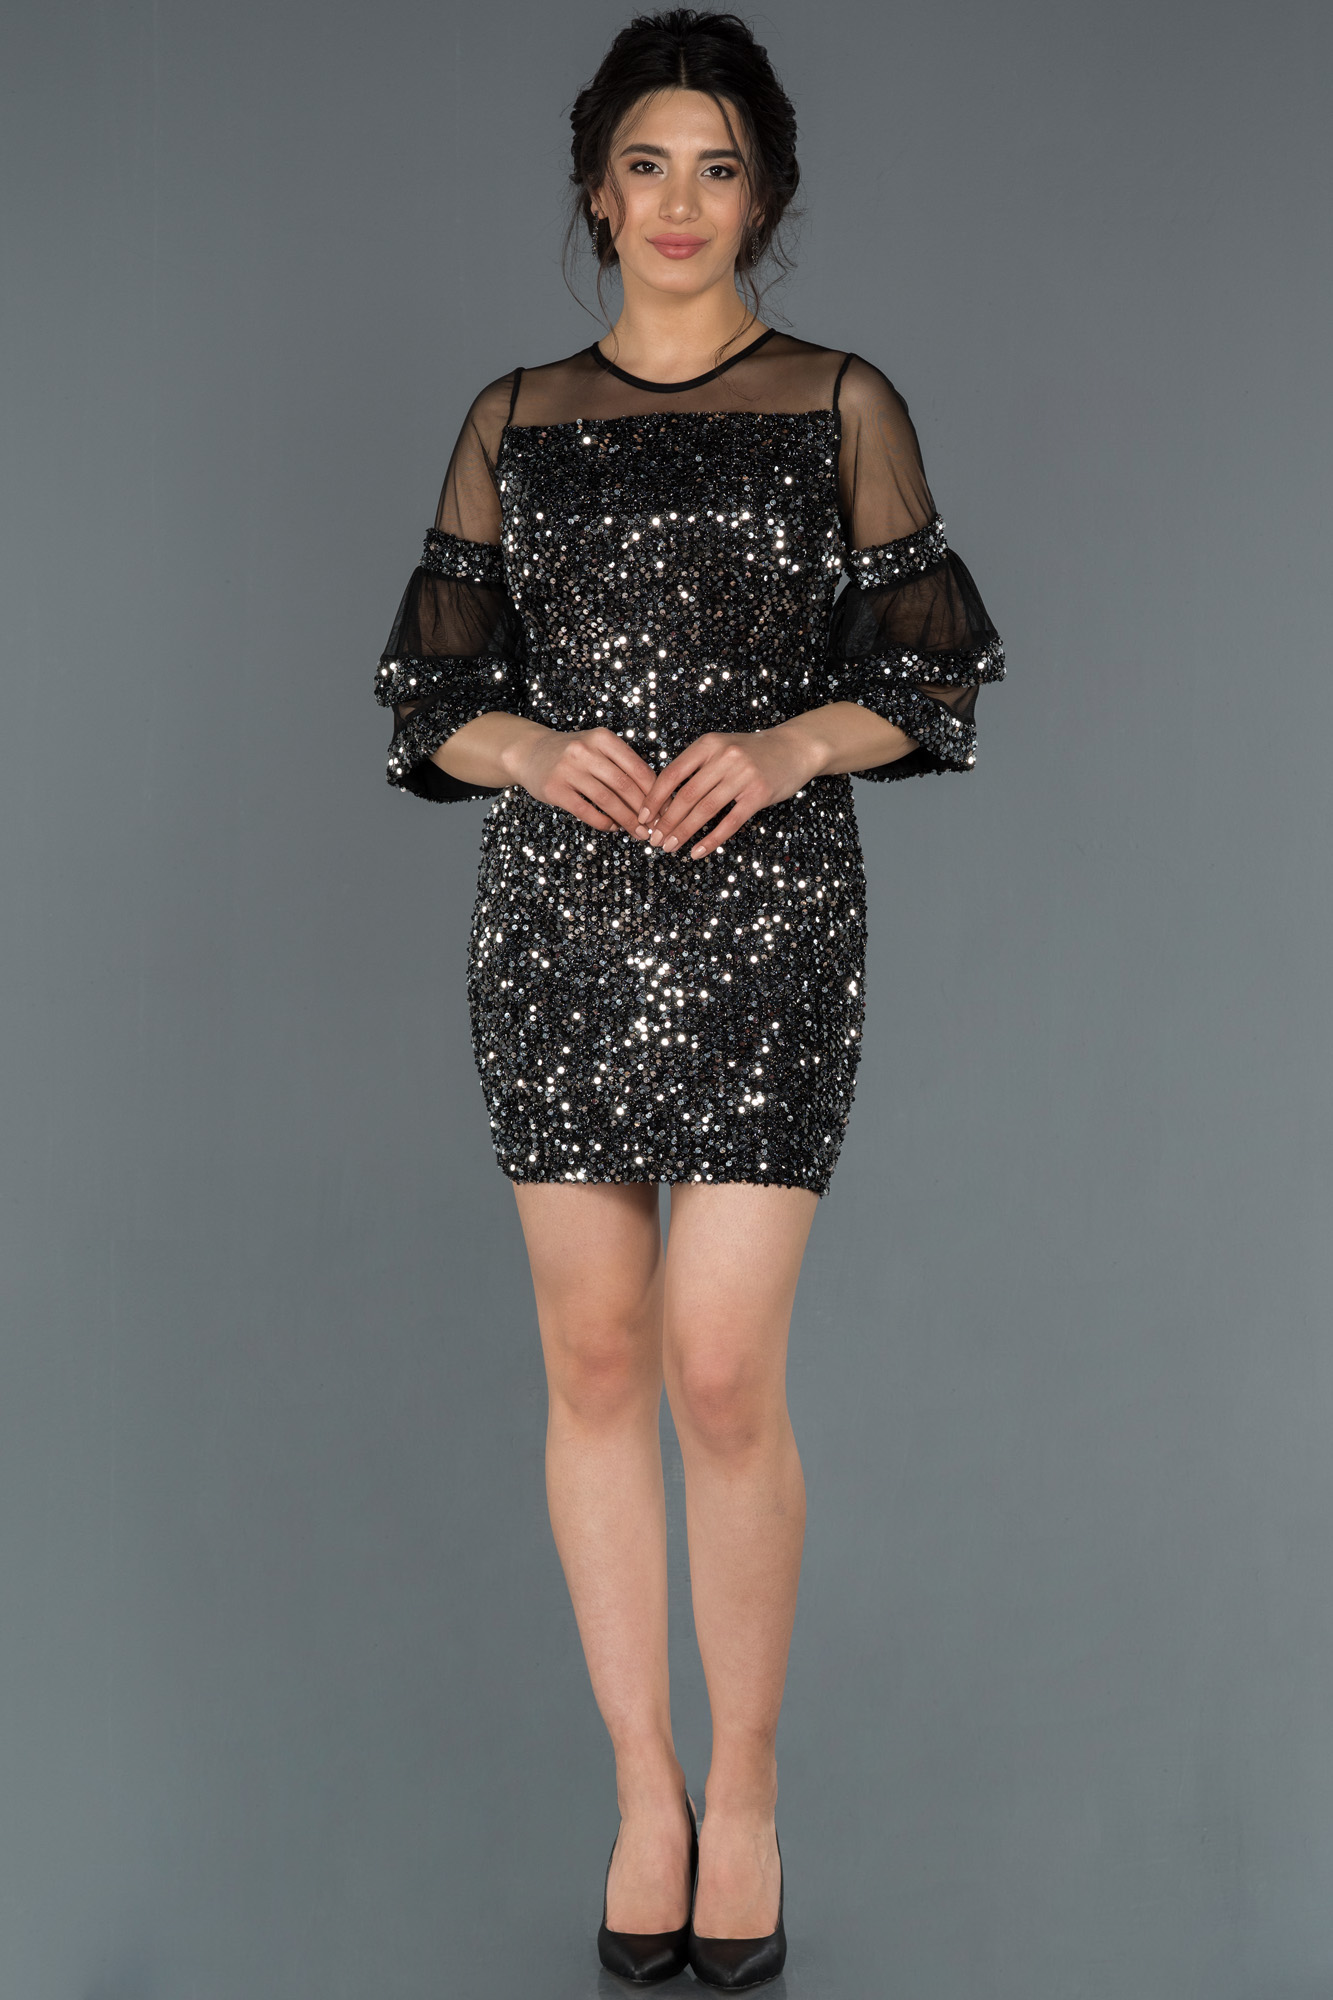 Siyah-Gümüş Kısa Pullu Davet Elbisesi